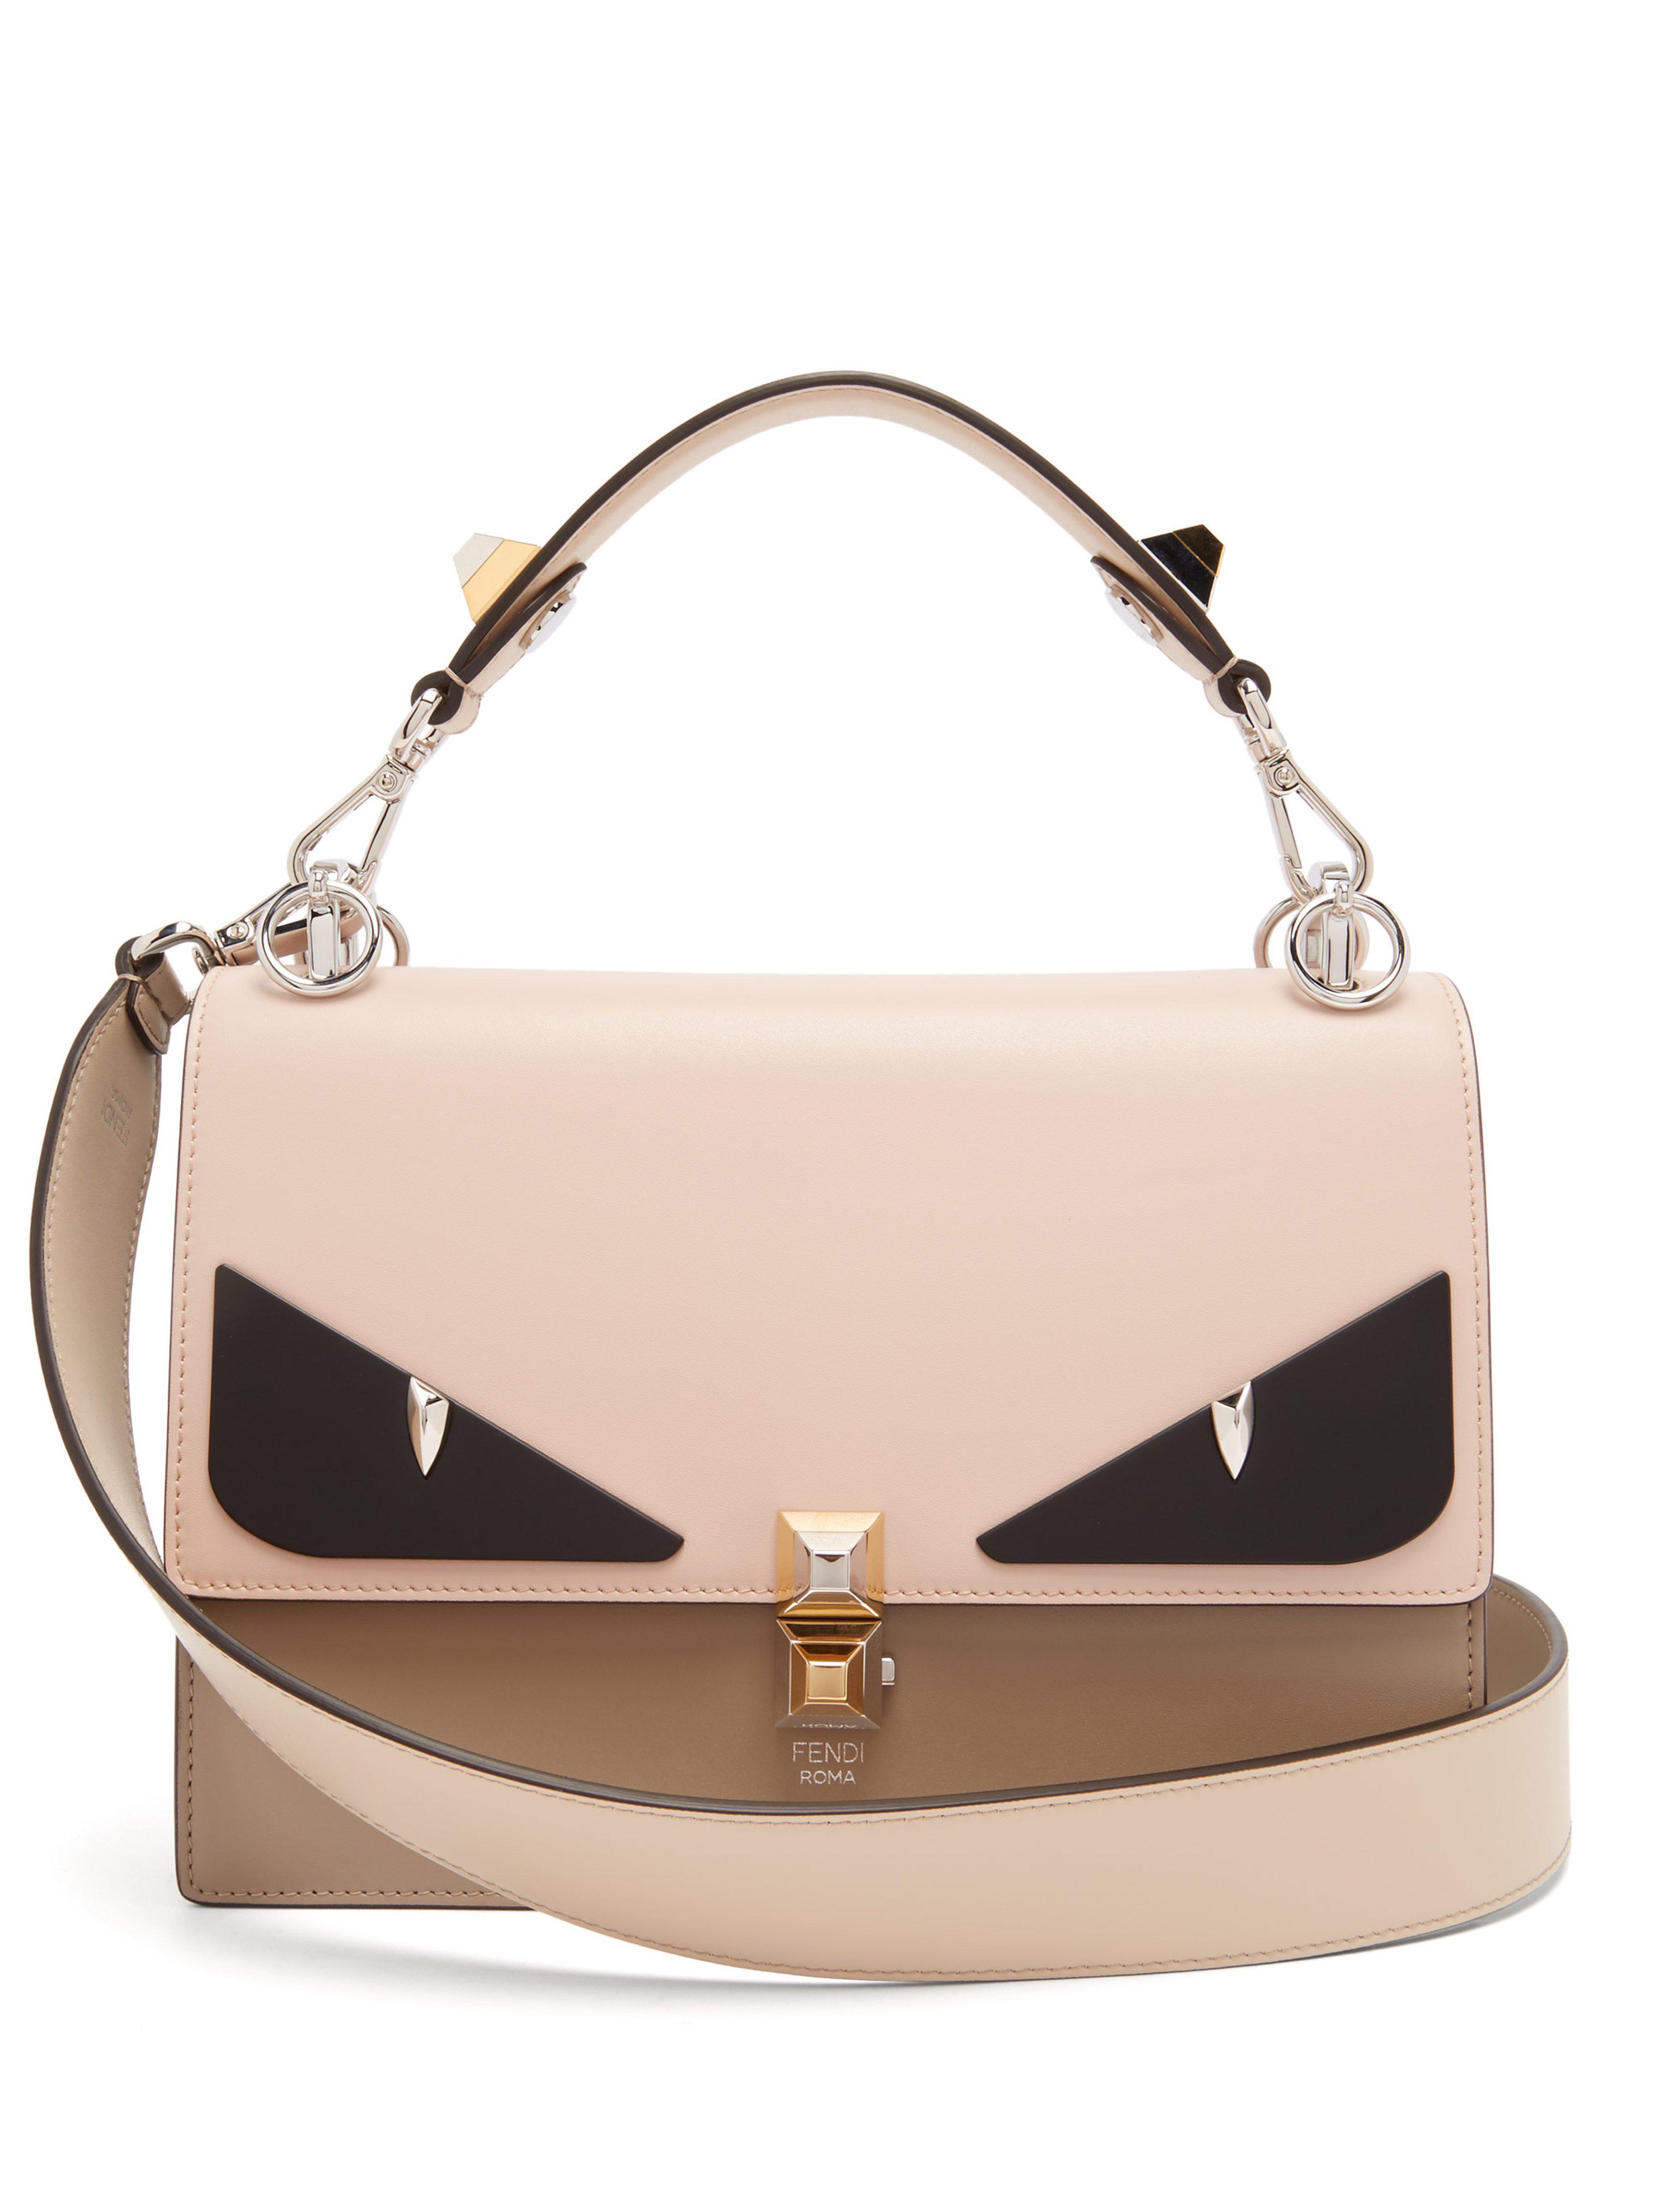 Fendi Kan I Monster Eyes Leather Bag - Save 24% - Lyst 5998a3871c434